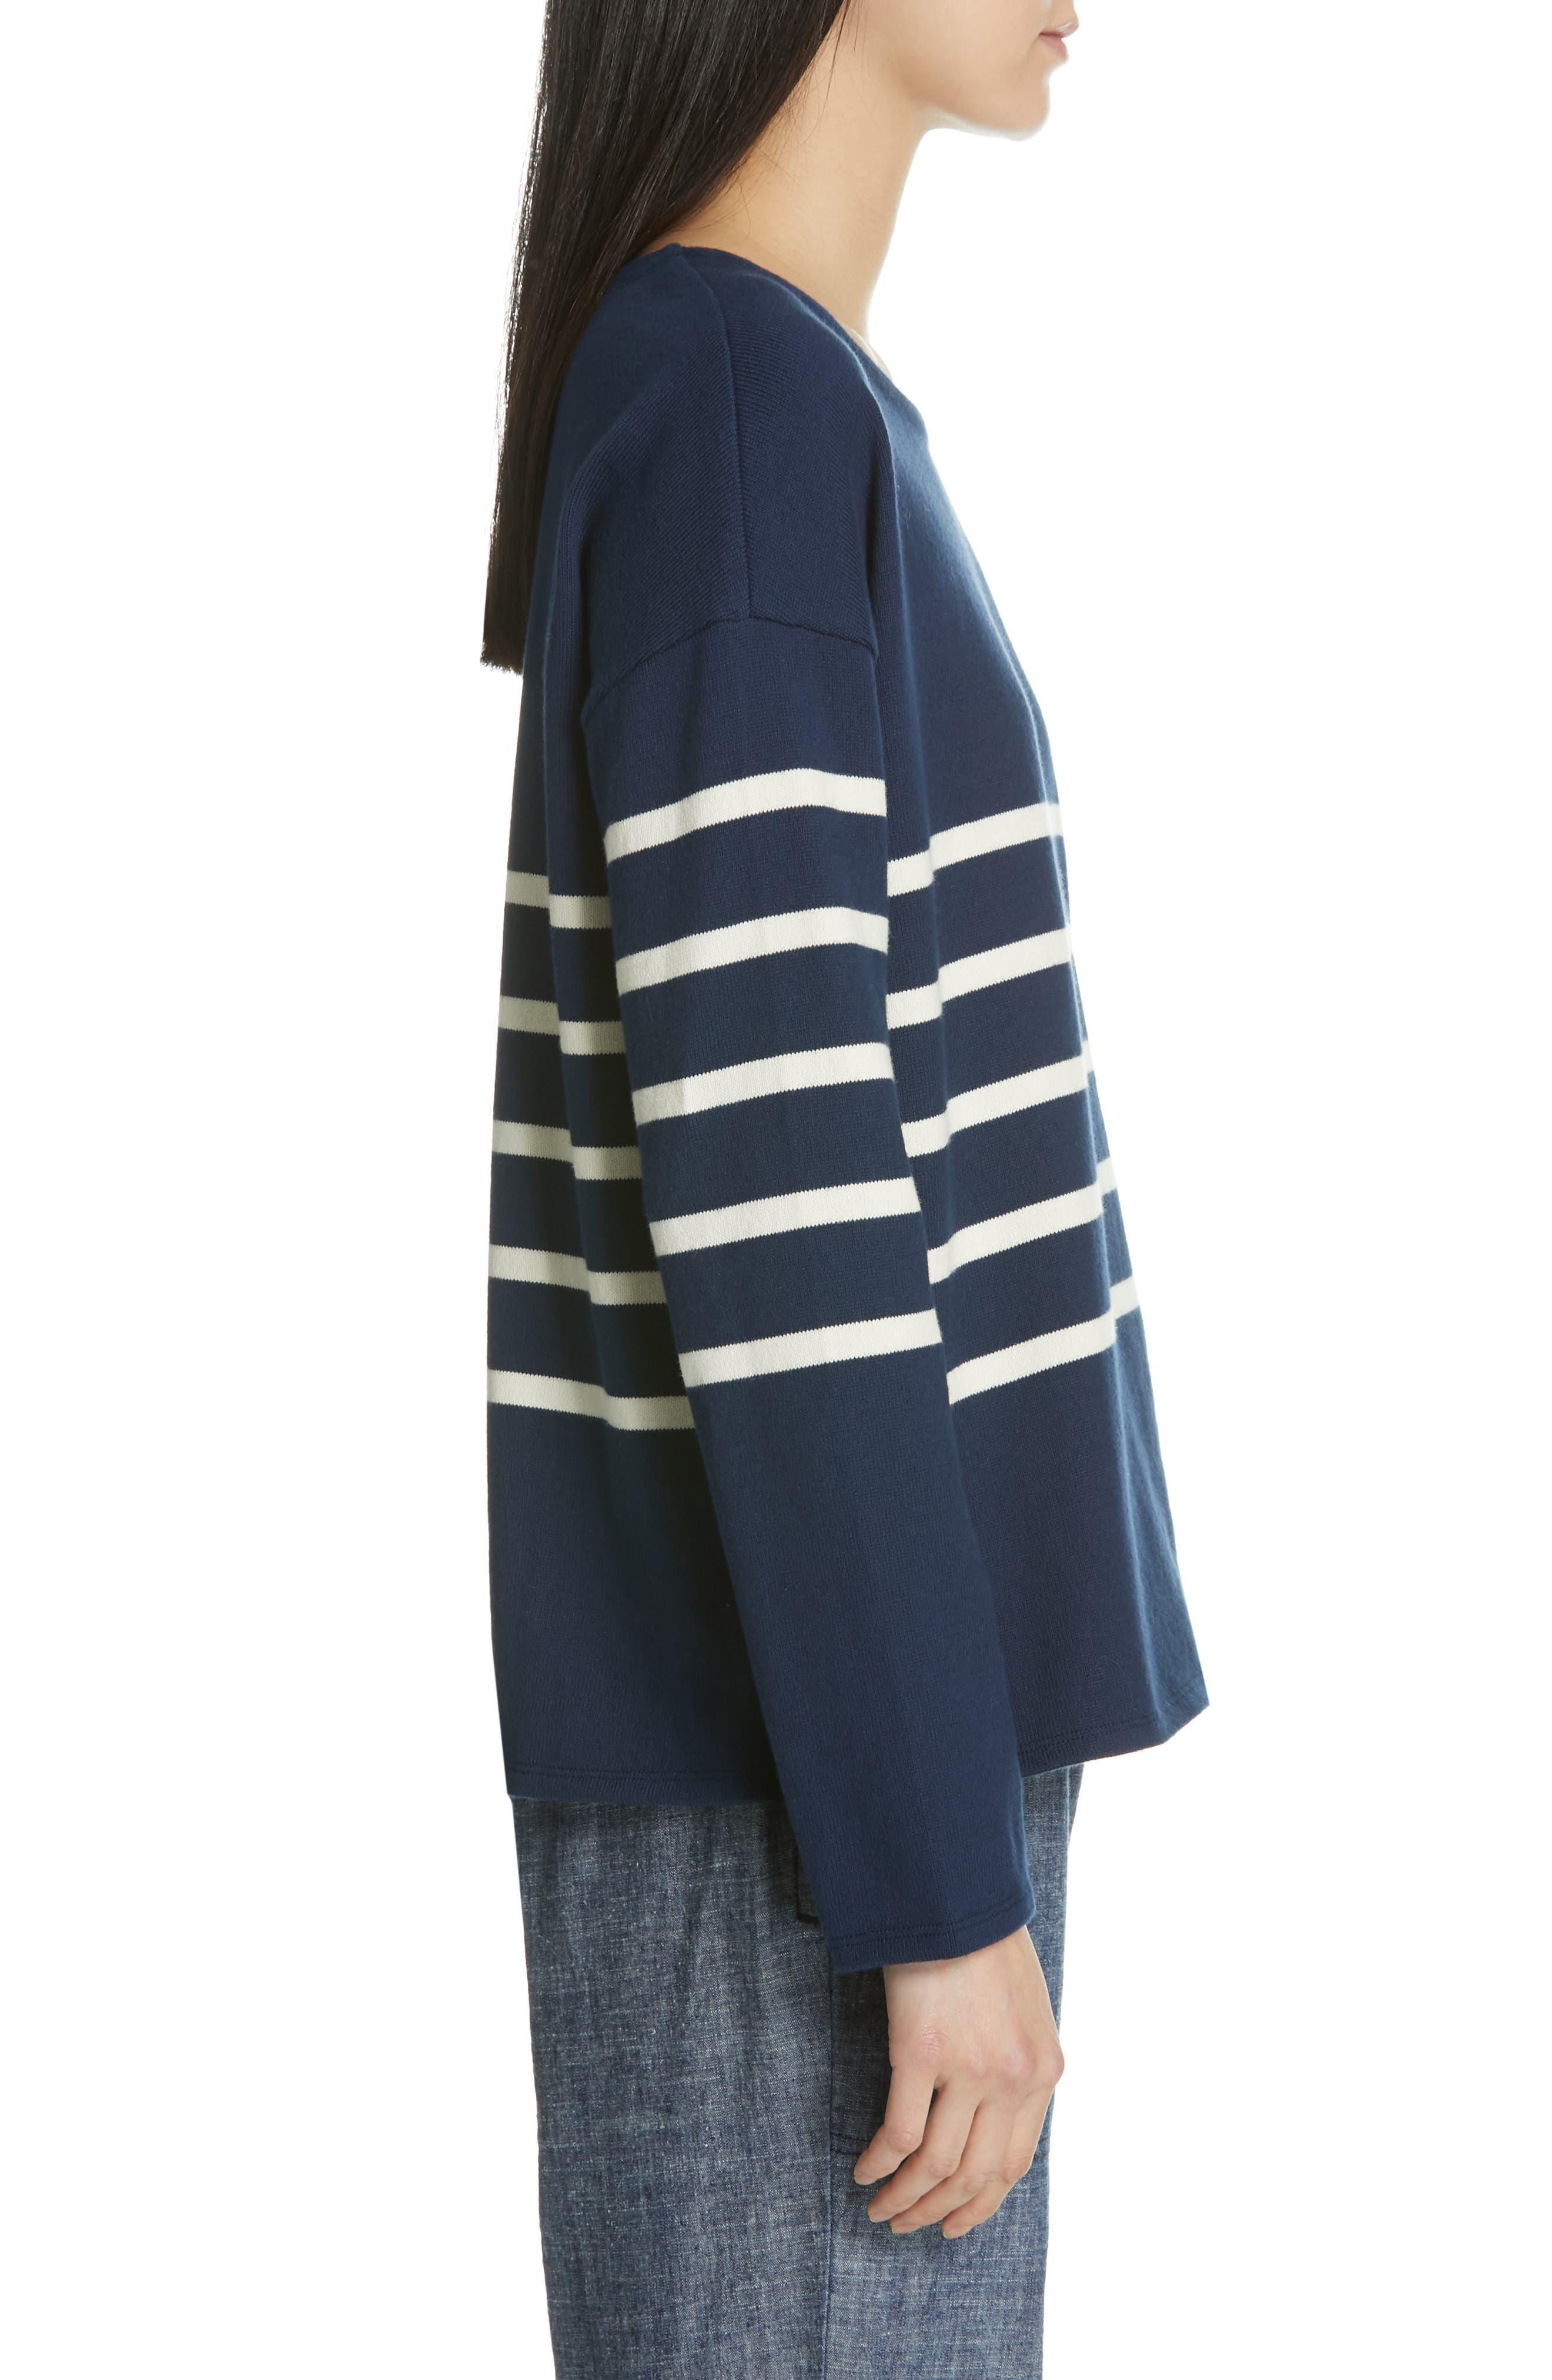 EILEEN FISHER, Stripe Organic Cotton Sweater, Alternate thumbnail 3, color, DENIM